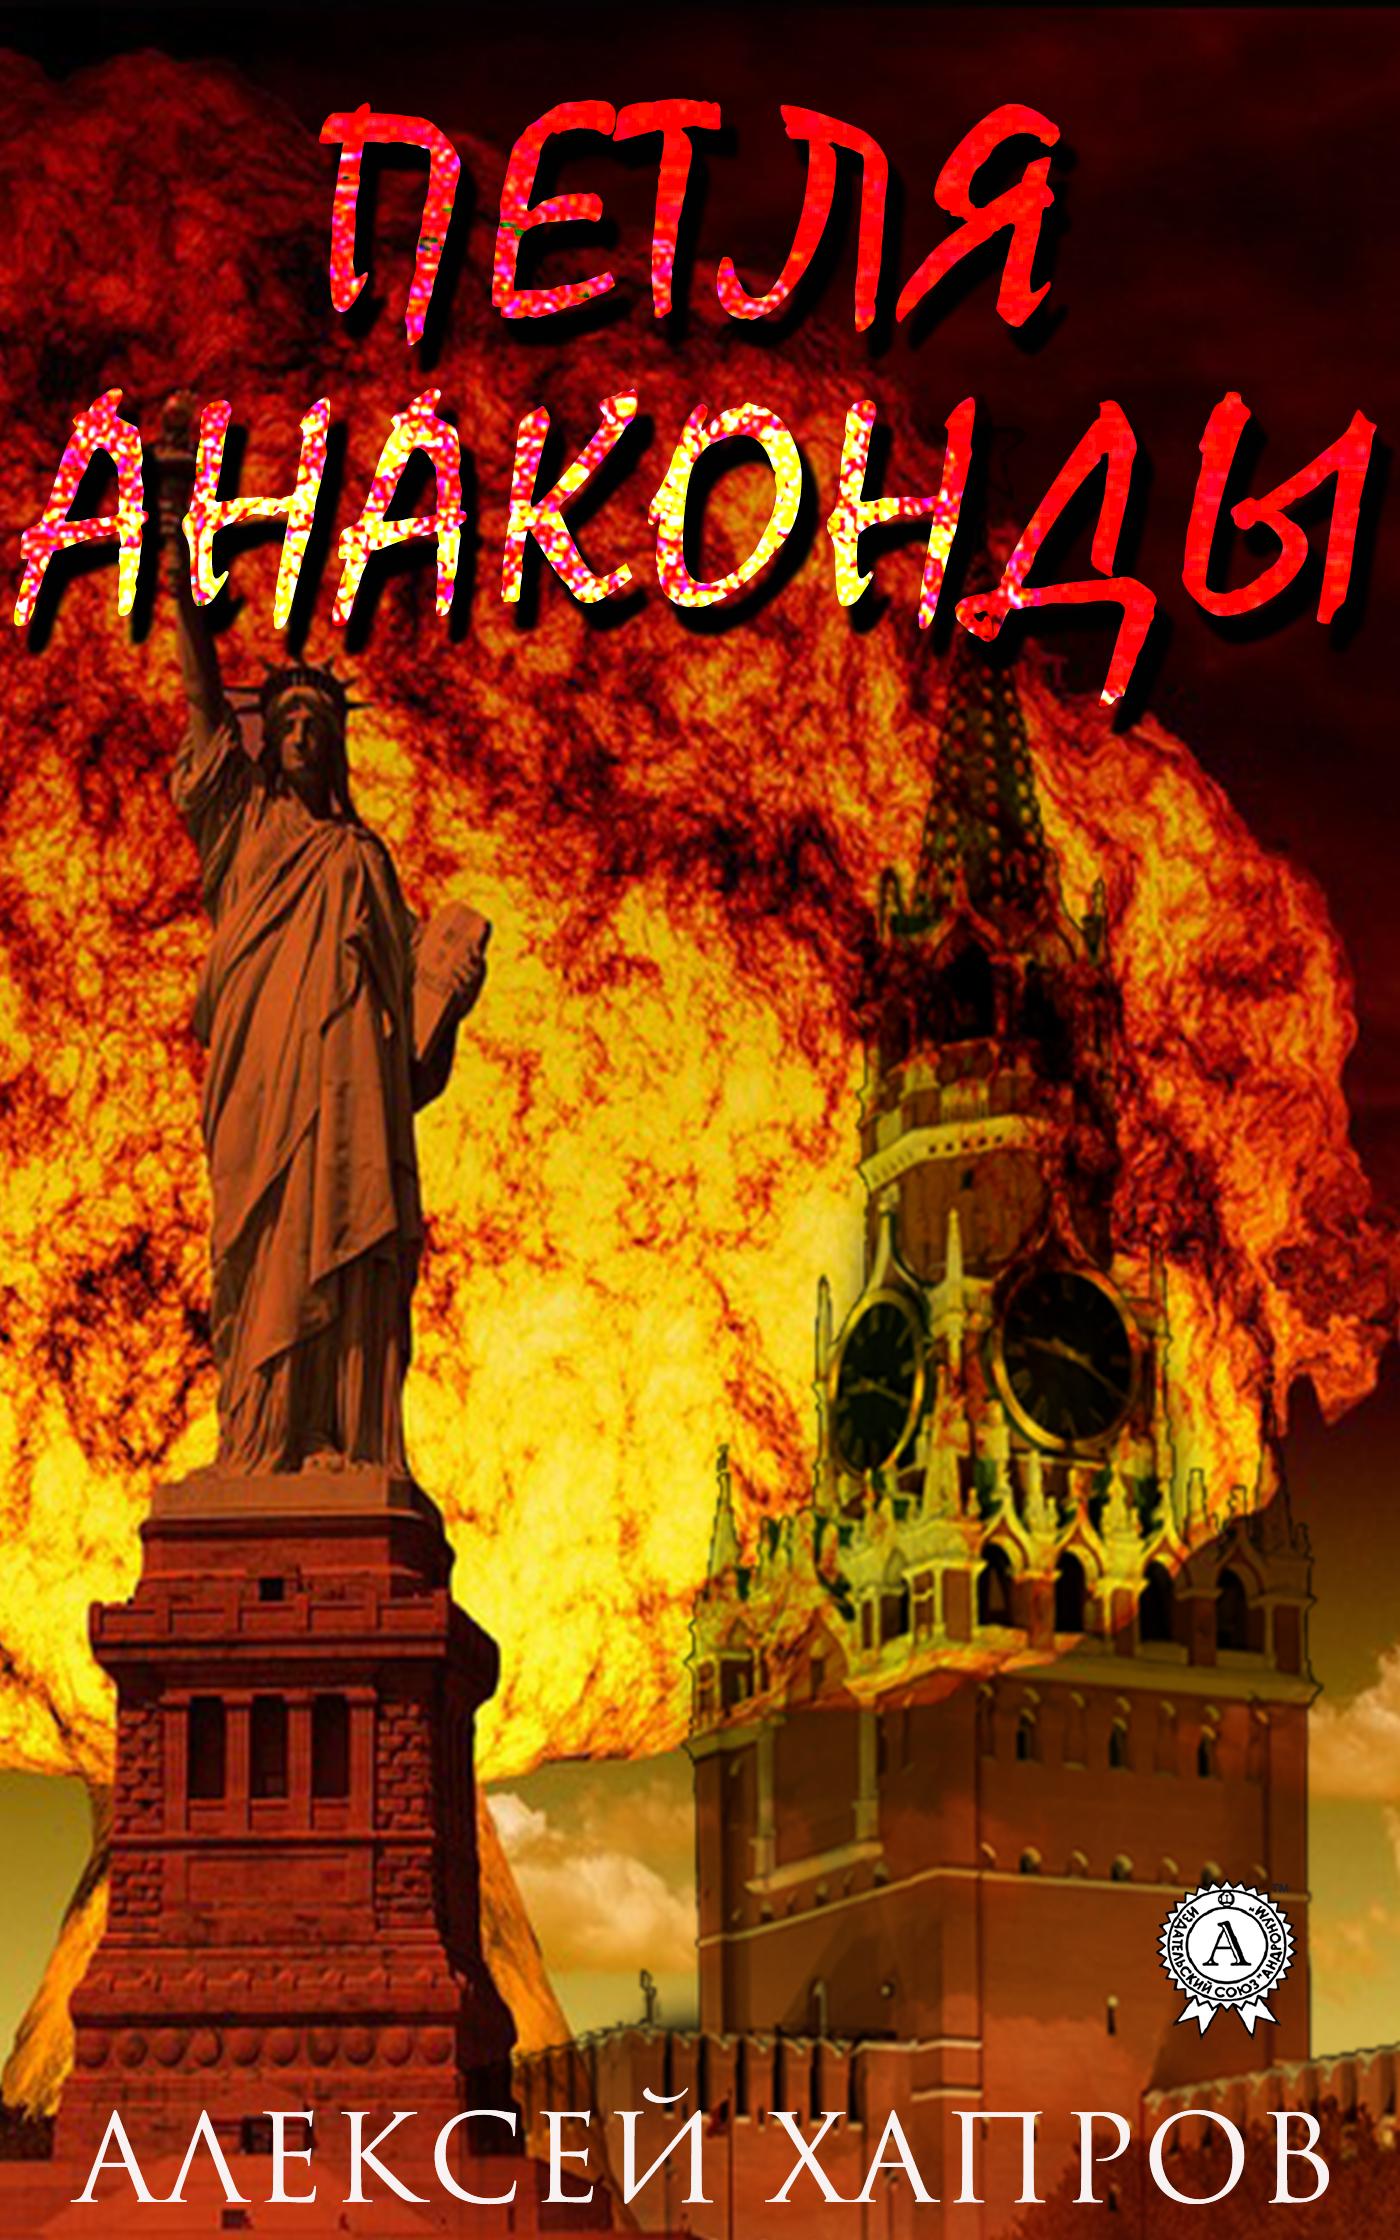 Алексей Хапров Петля анаконды printio план по захвату мира